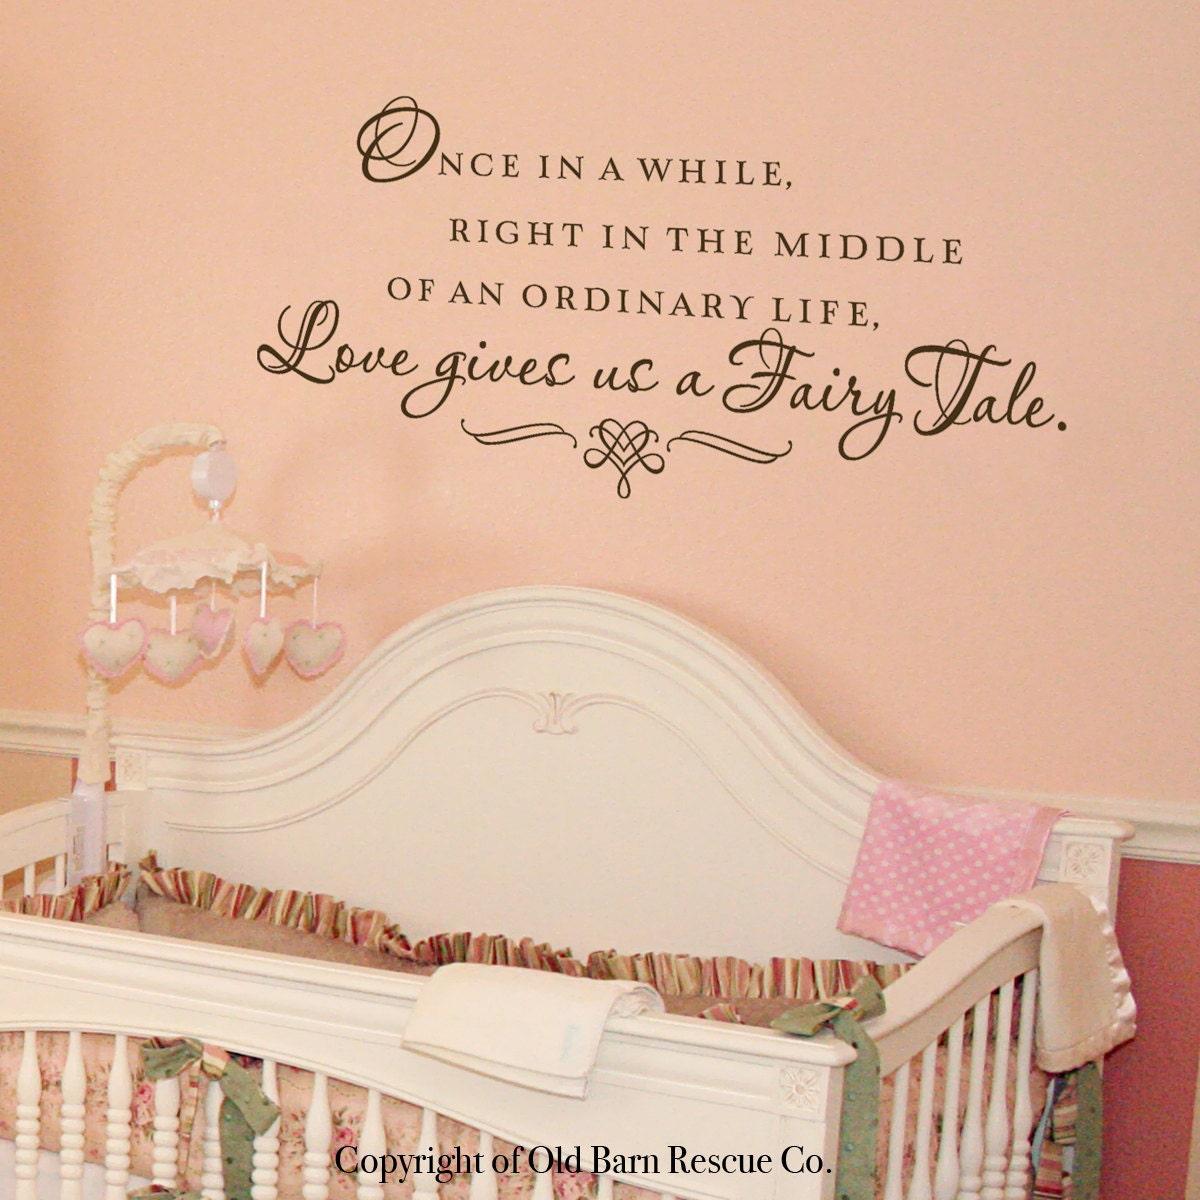 Penelope S Woodland Fairy Tale Nursery: Baby Wall Decals Love Gives Us A Fairy Tale Nursery Wall